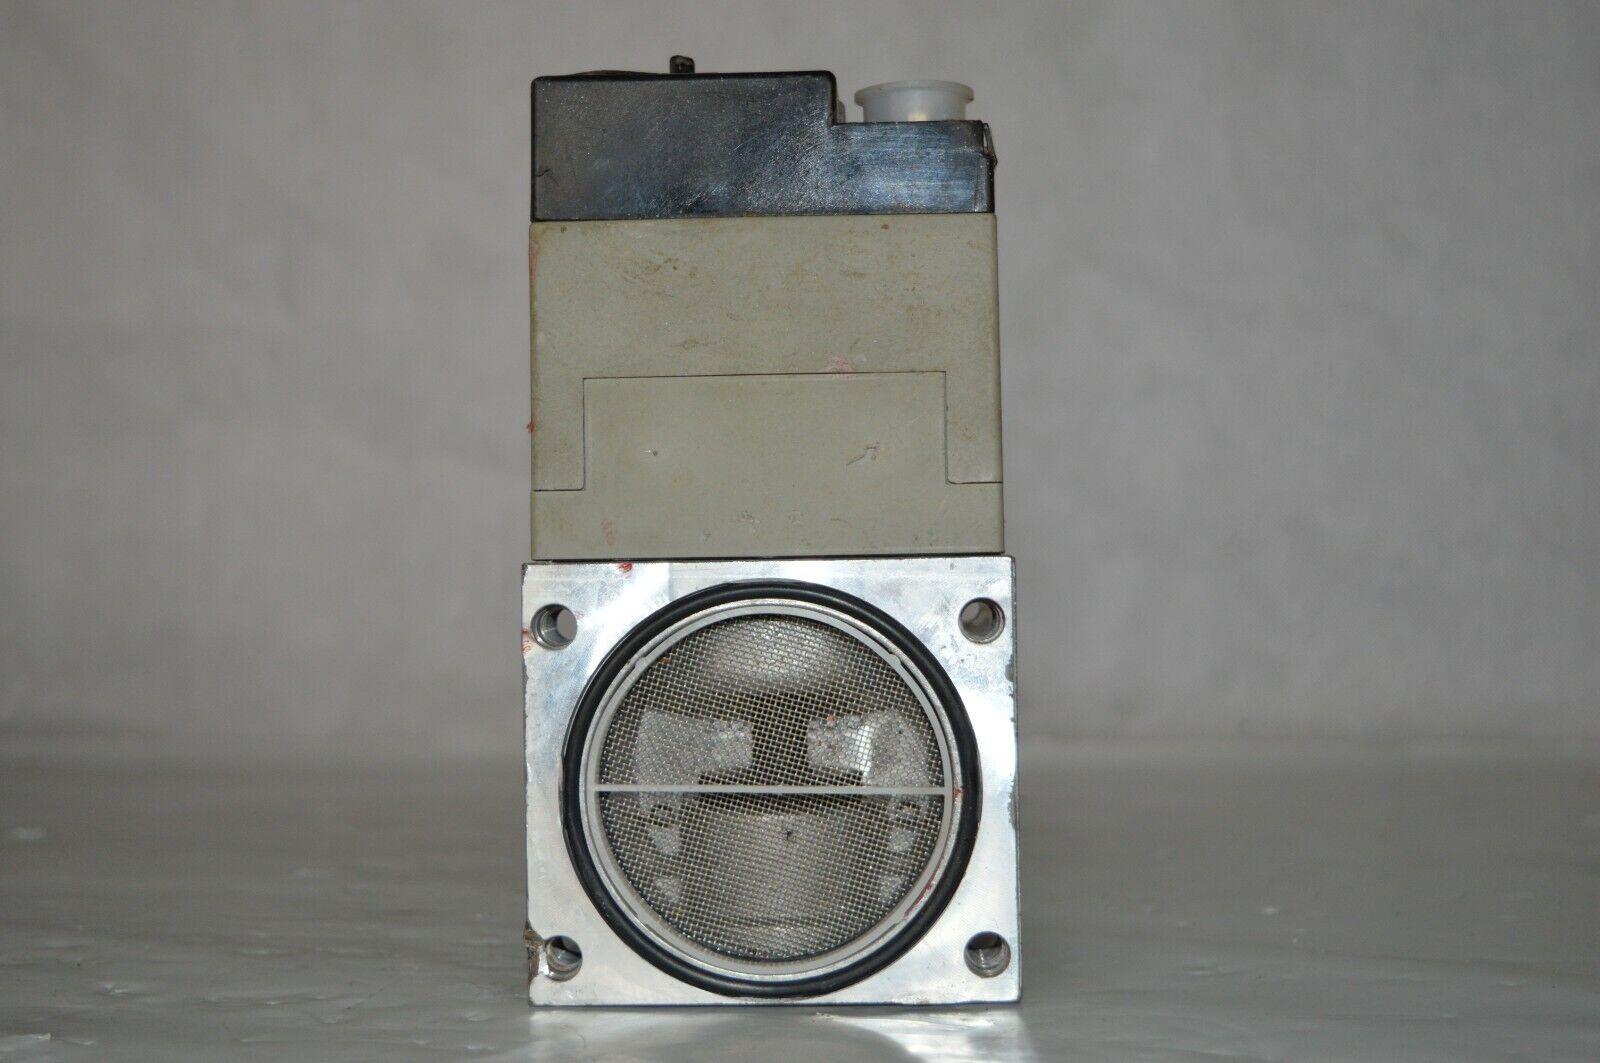 DUNGS Gas-Magnetventil DMV-D 512 11  (AB250)